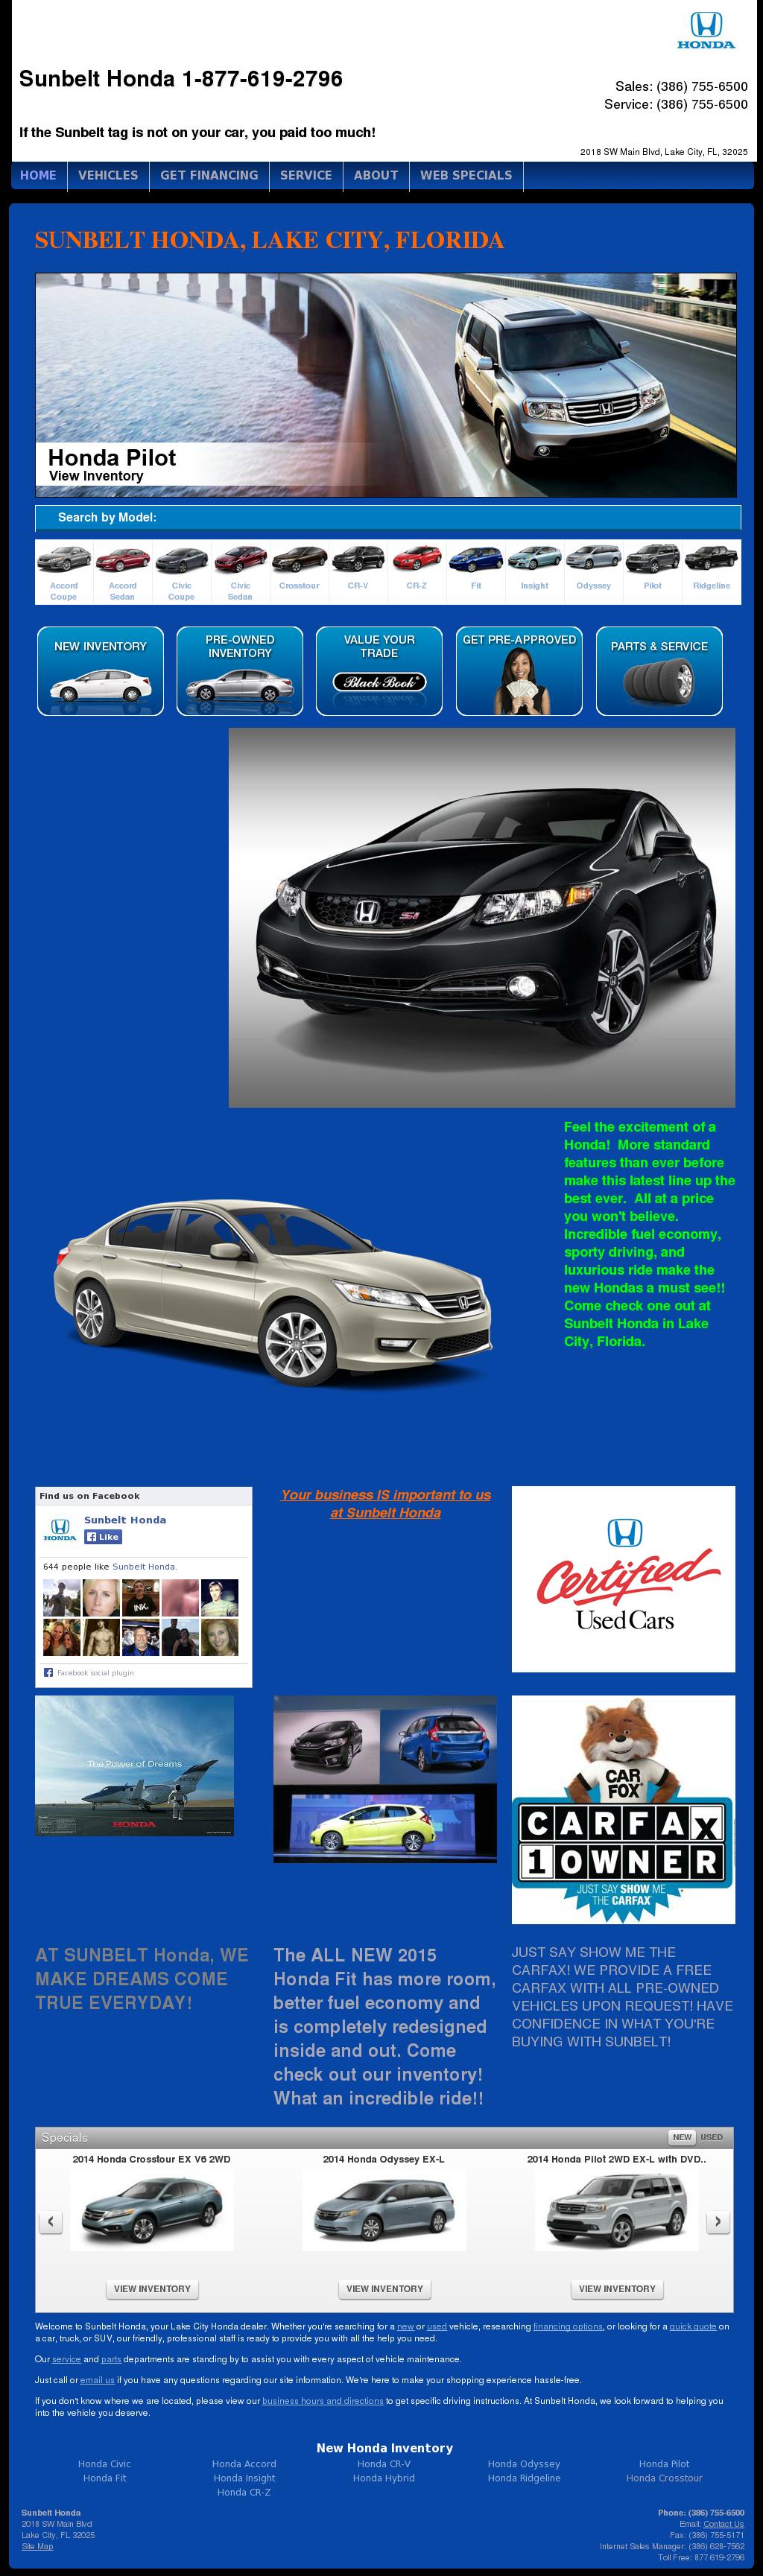 Wonderful Sunbelt Honda Competitors, Revenue And Employees   Owler Company Profile